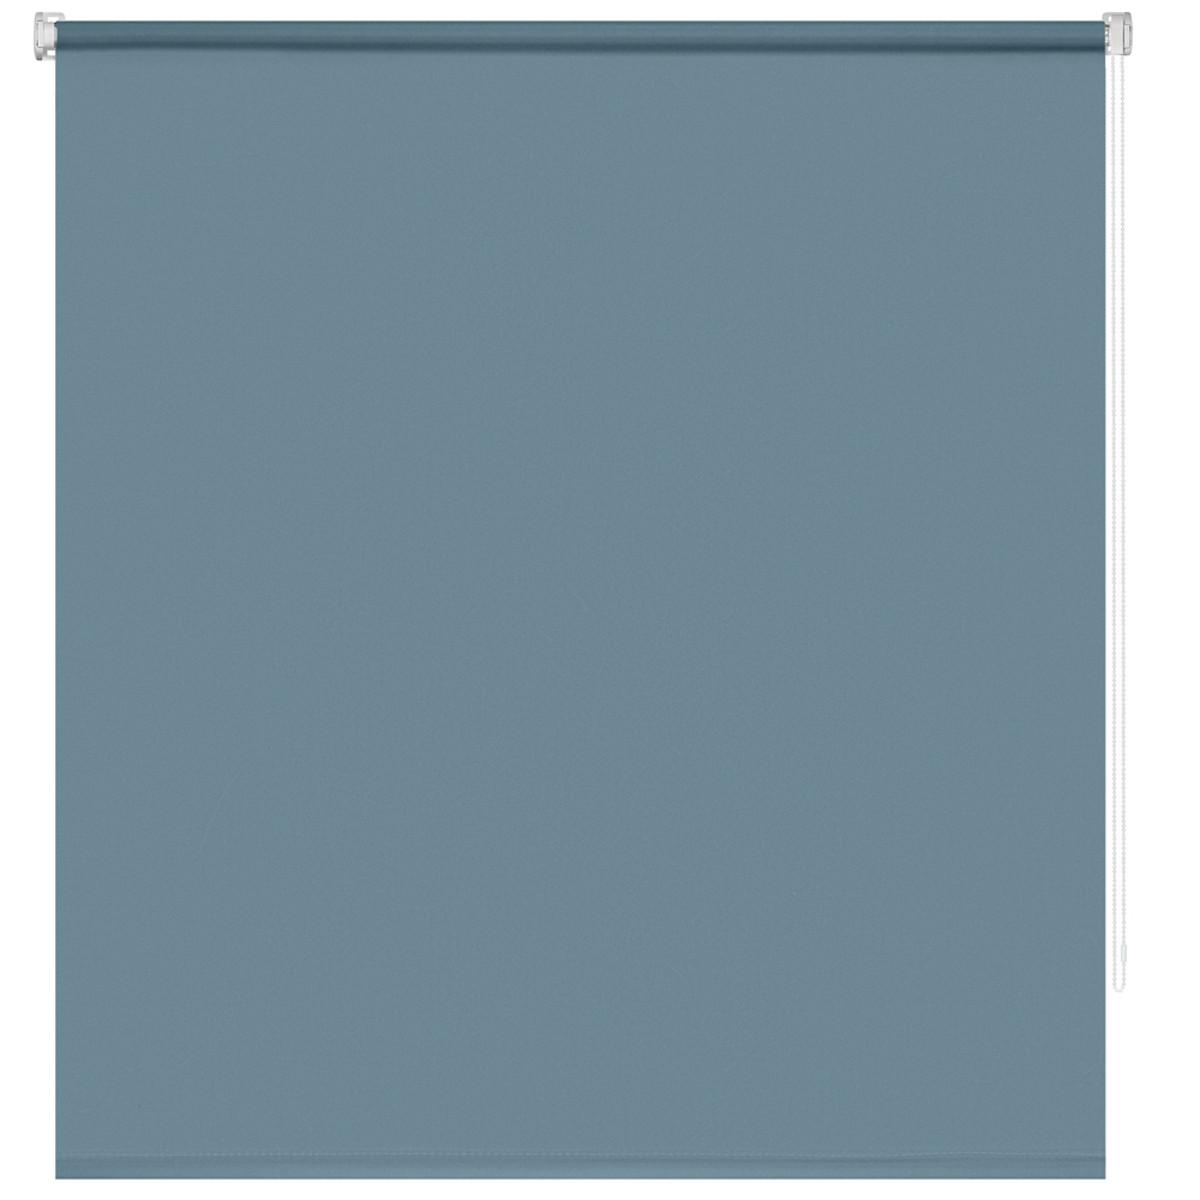 Рулонная Ора Decofest Плайн 120Х160 Цвет Бирюзовый